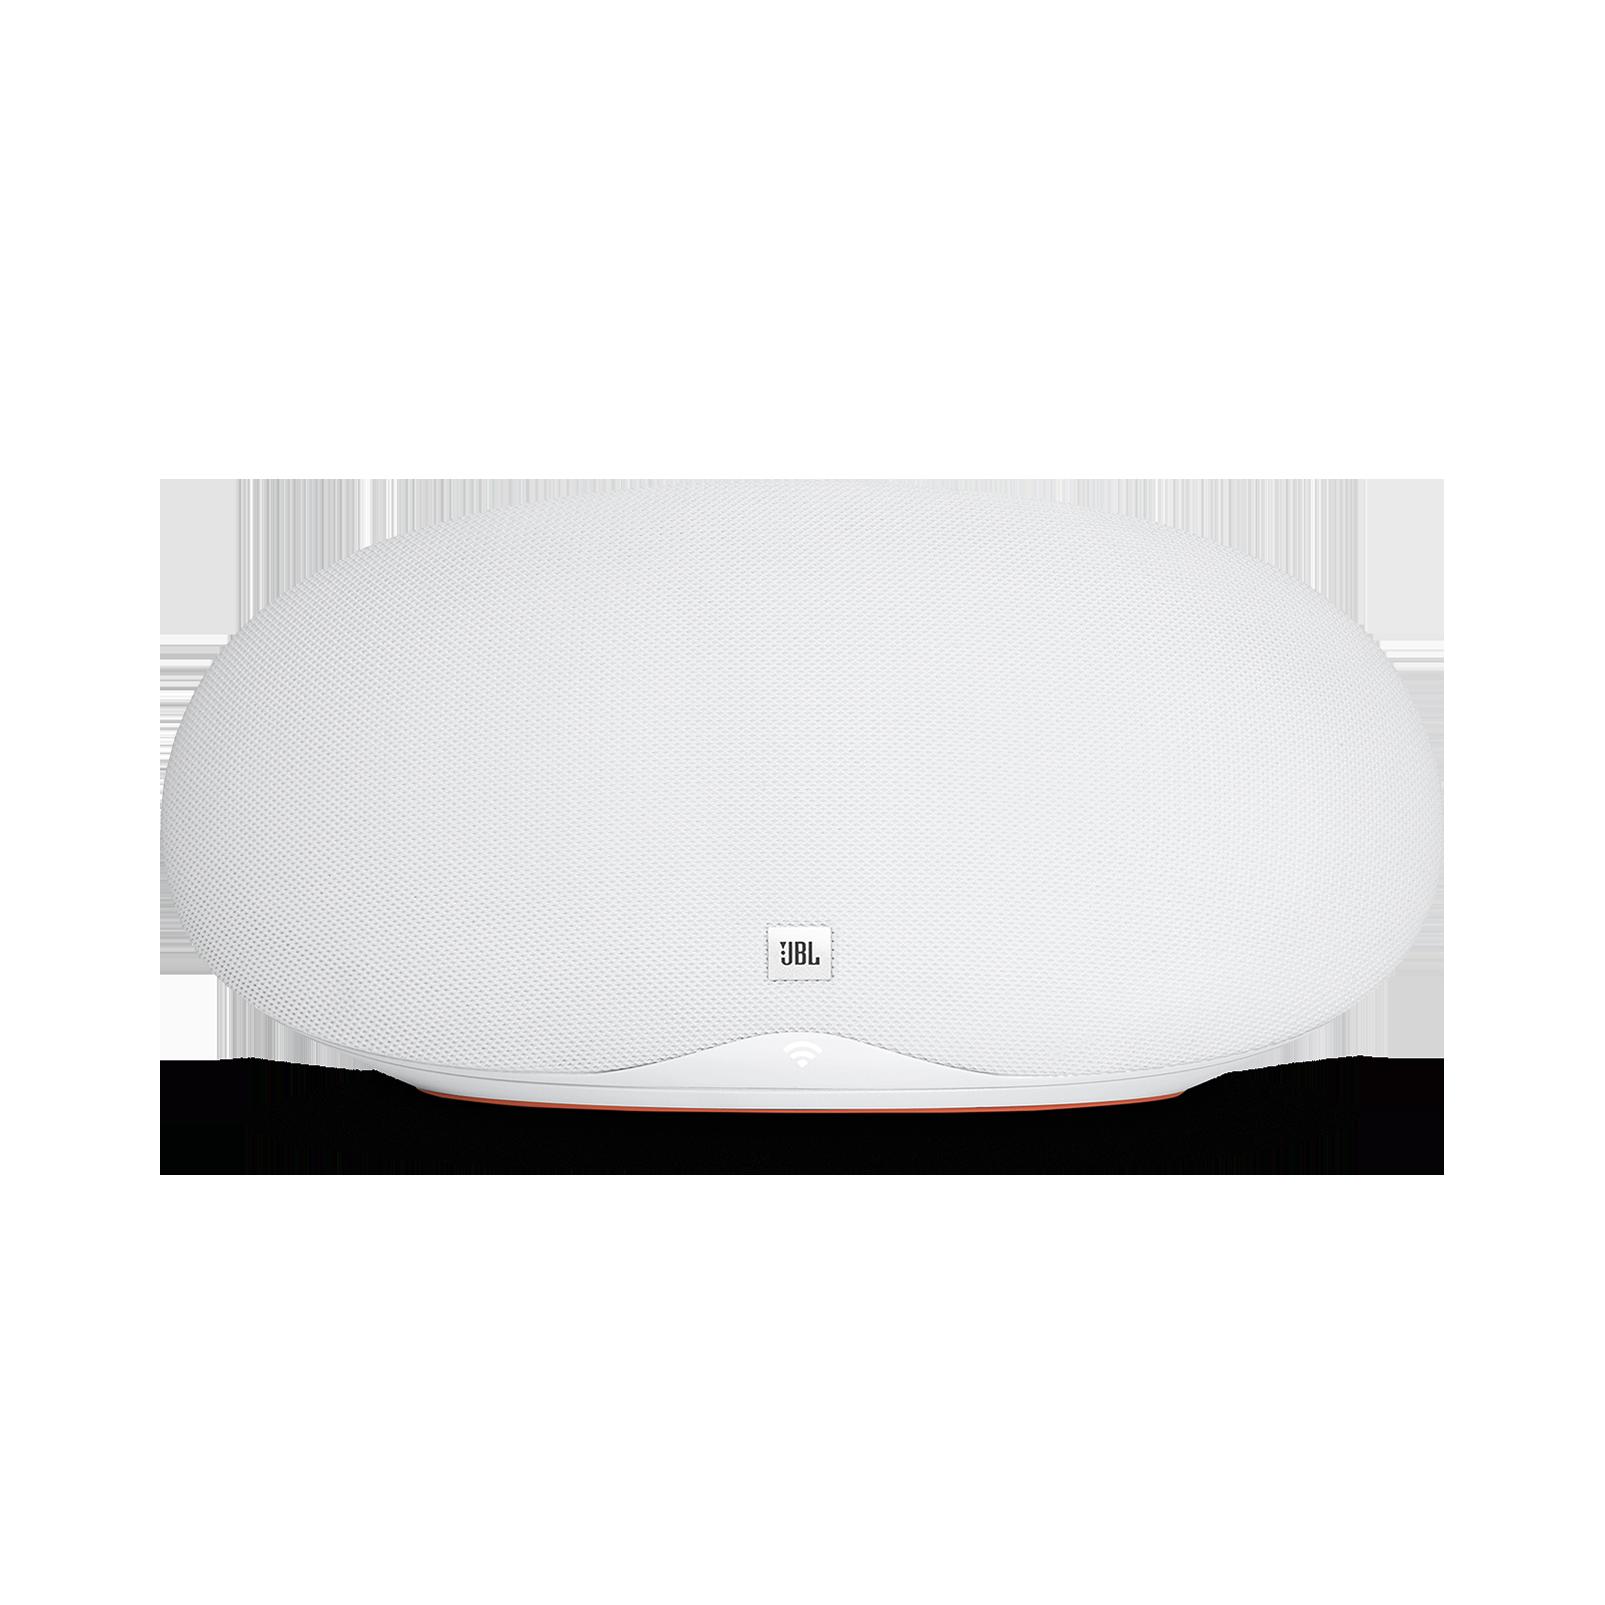 JBL Playlist - White - Wireless speaker with Chromecast built-in - Front